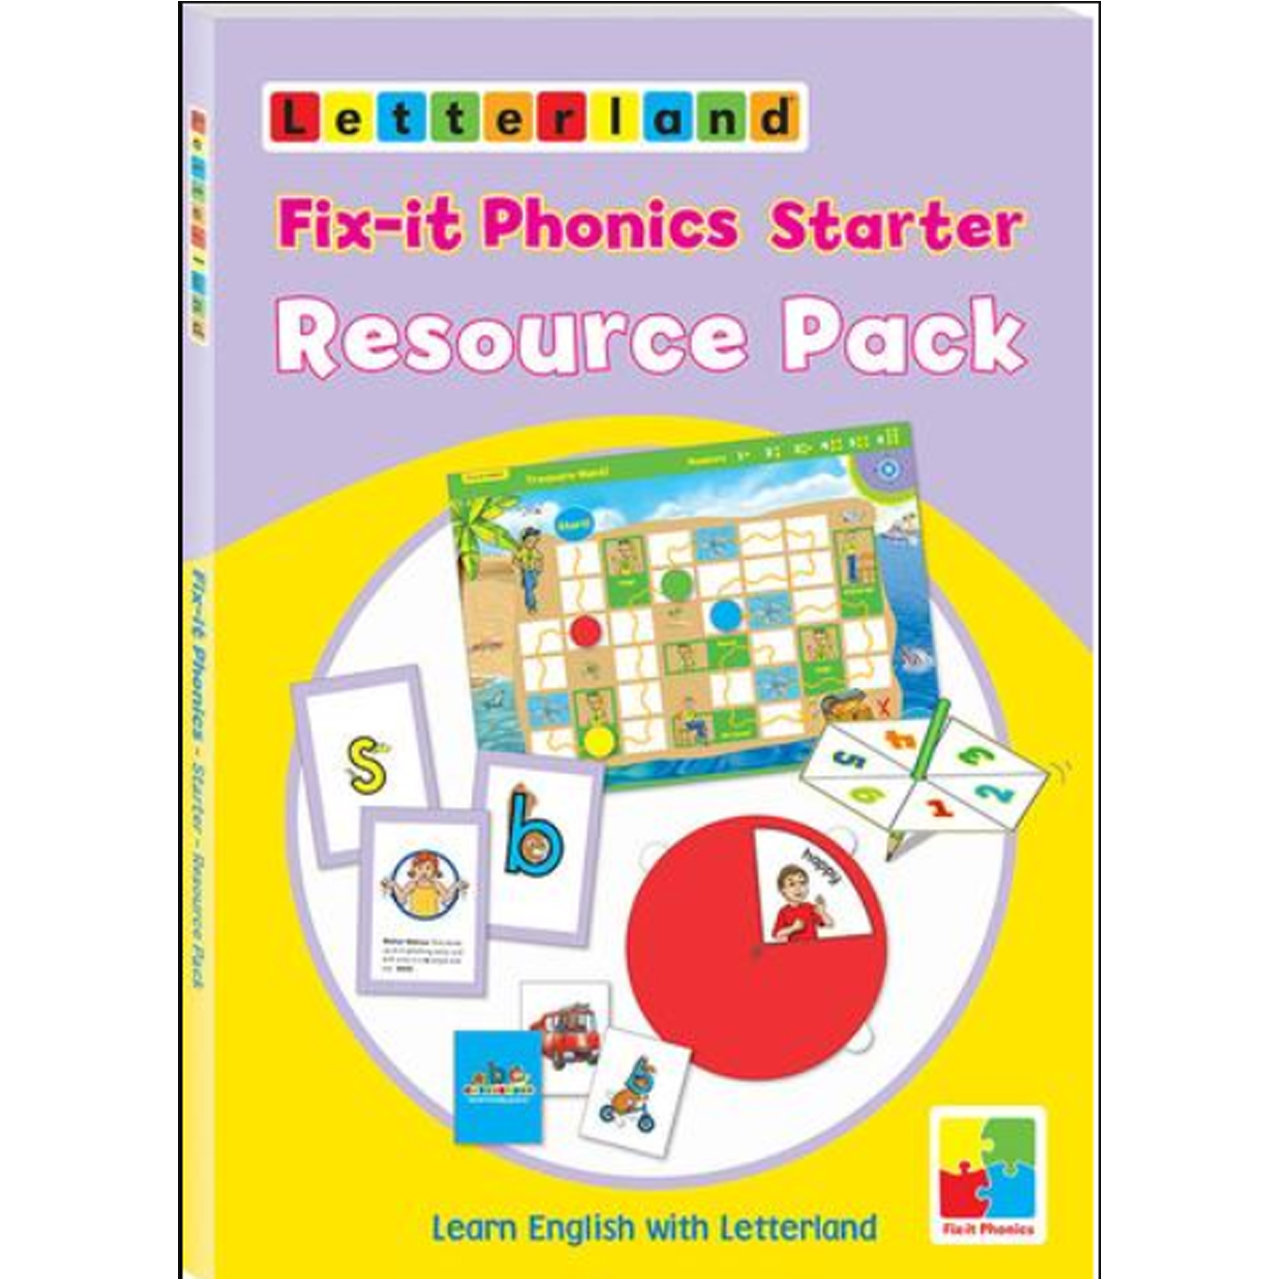 Fix-it Phonics - Starter Level - Resource Pack (Набор игр-пособий для учителя)